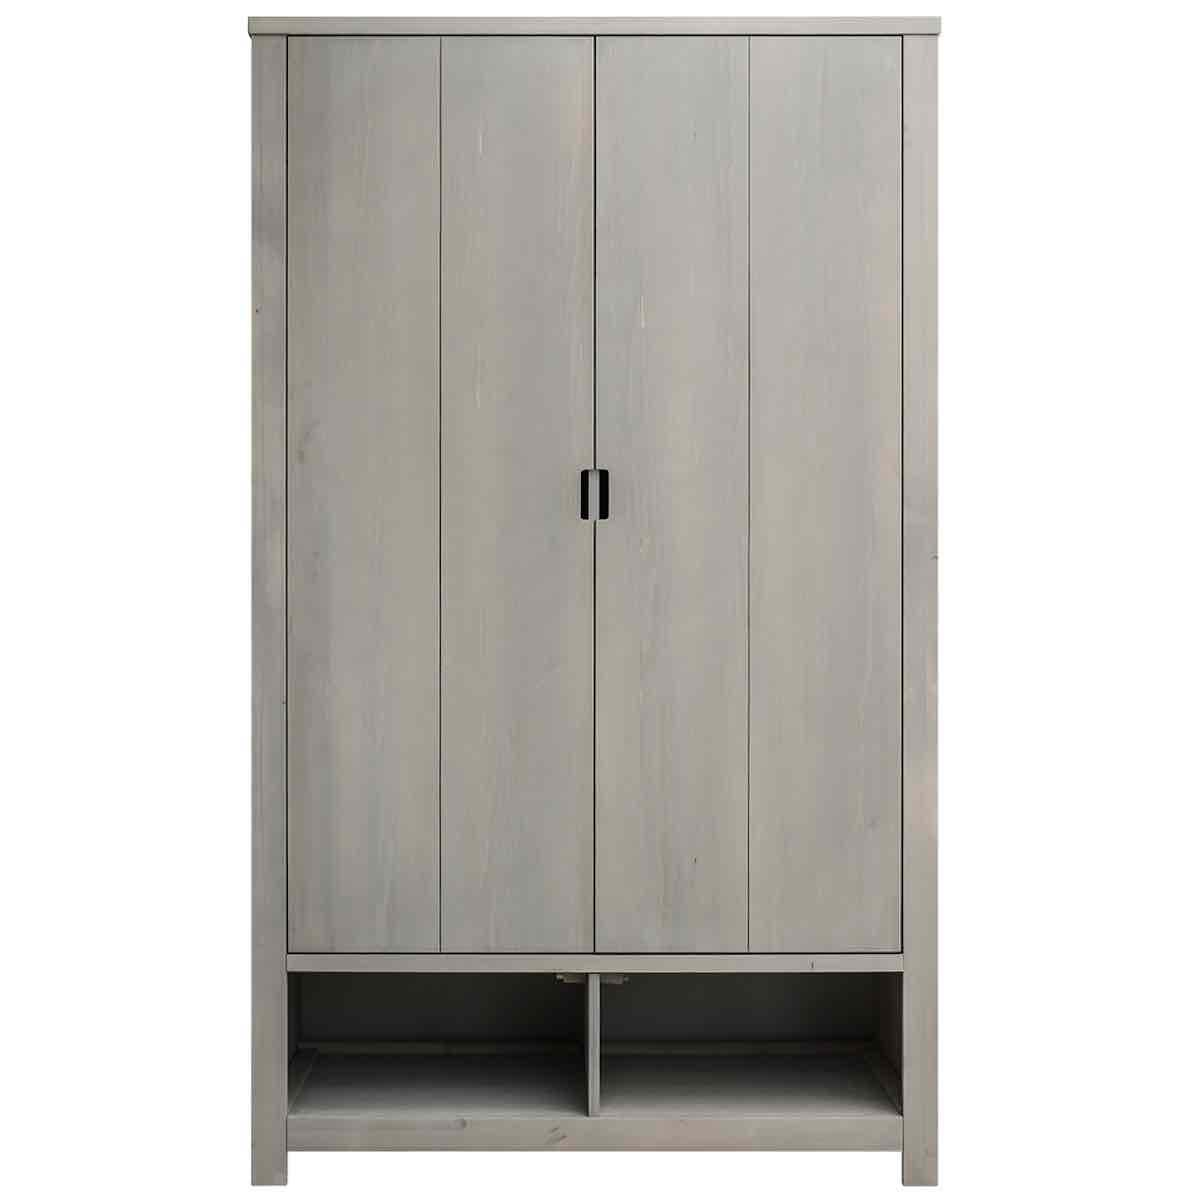 Armoire 2 portes XL BASIC WOOD Bopita gravel wash (sans tiroirs)